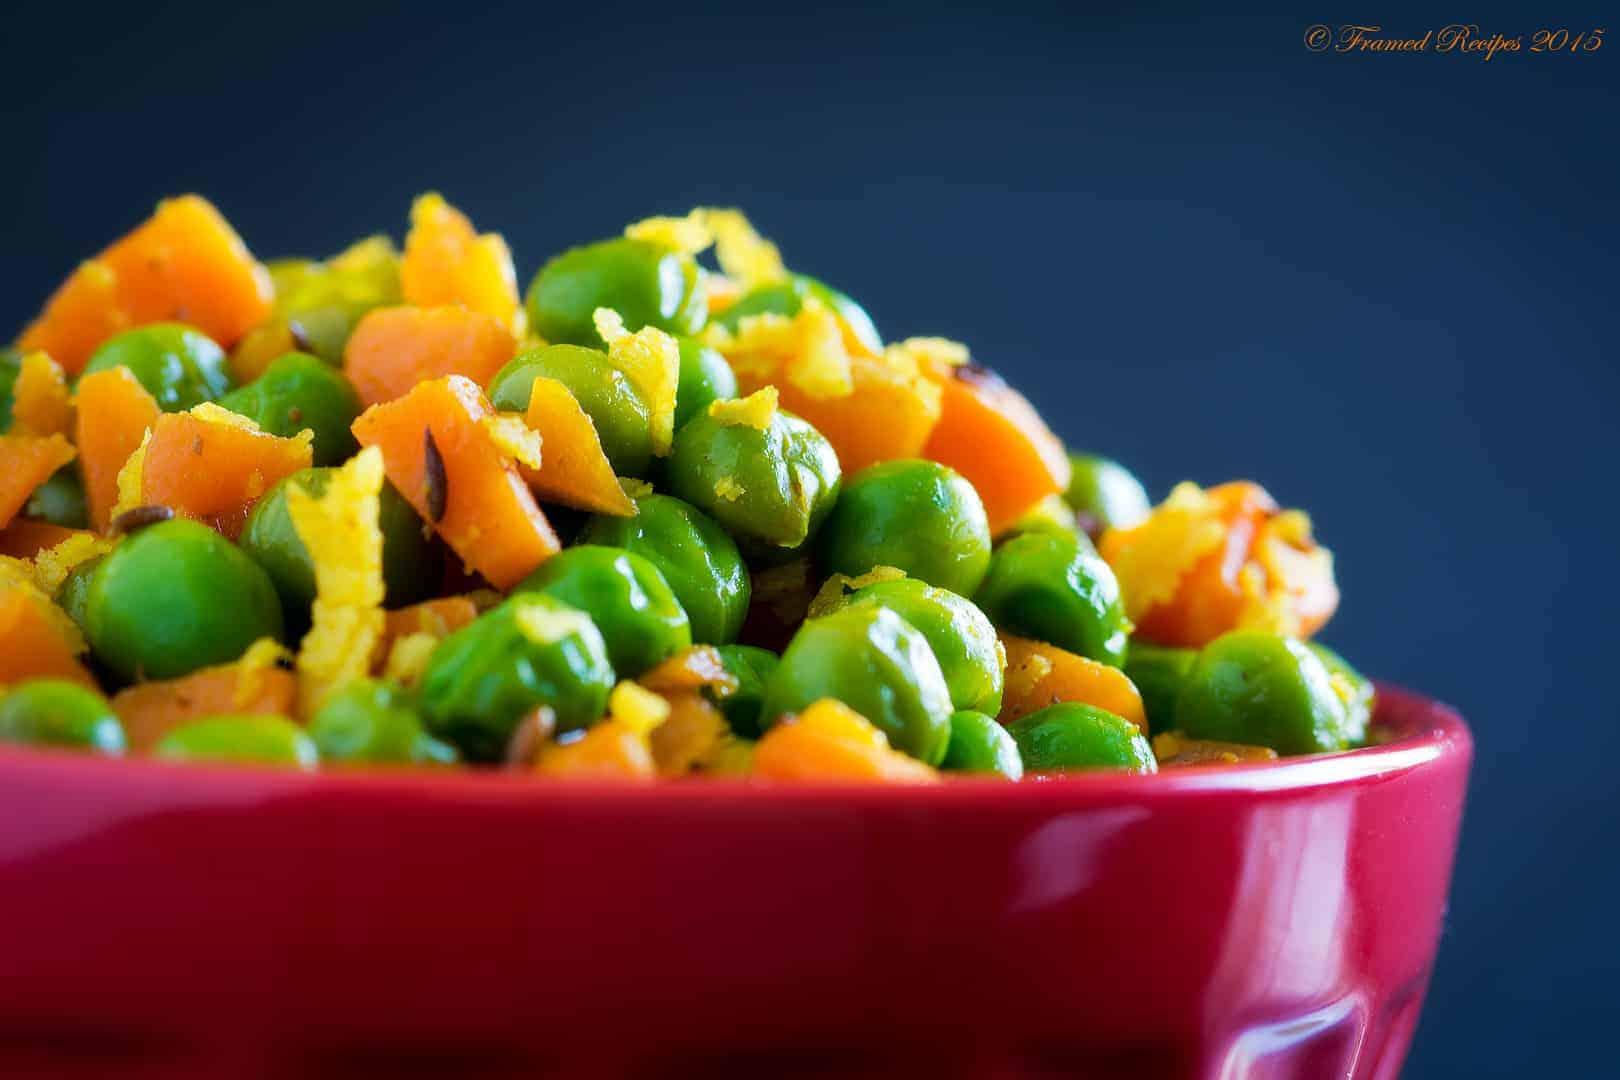 DSC_8170_Carrot_Peas_Stir_Fry_01